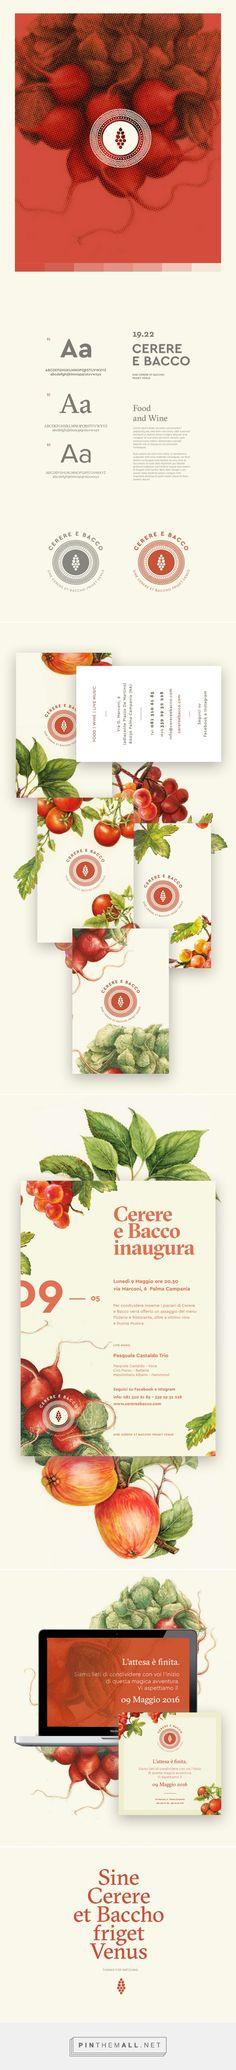 Cerere e Bacco - Branding on Behance - created via https://pinthemall.net